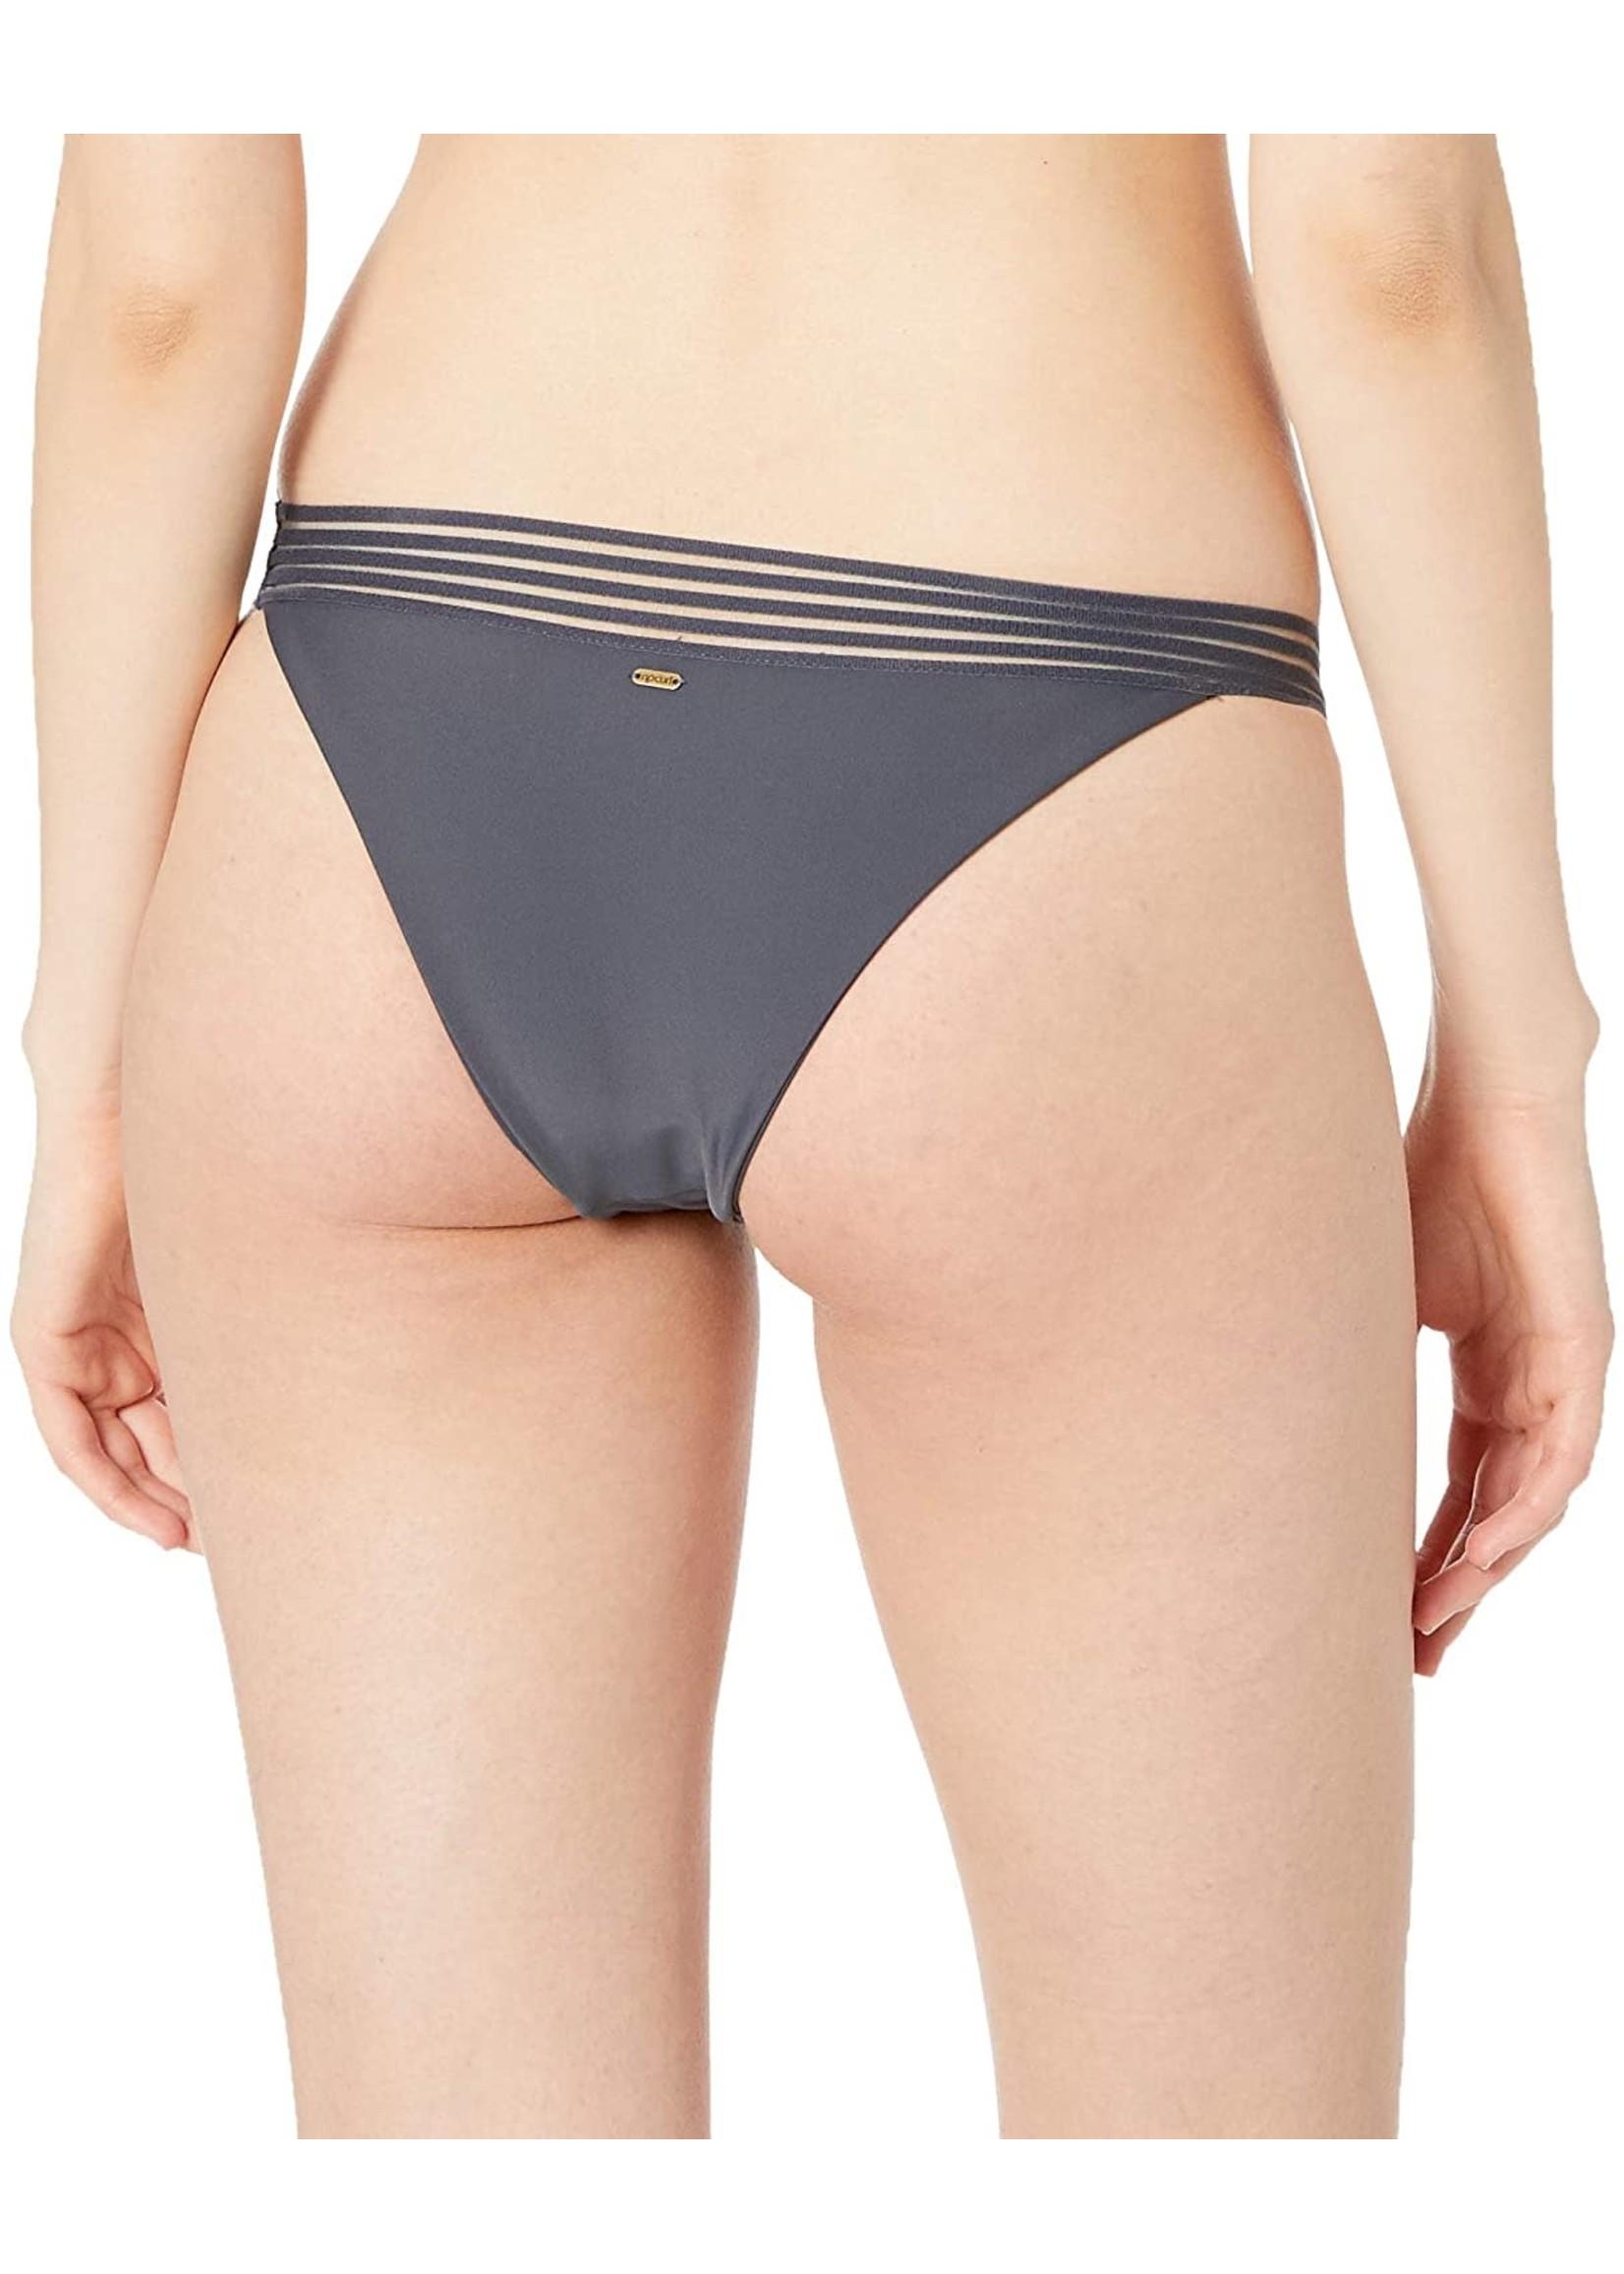 RIP CURL Bas de bikini Illusion Banded